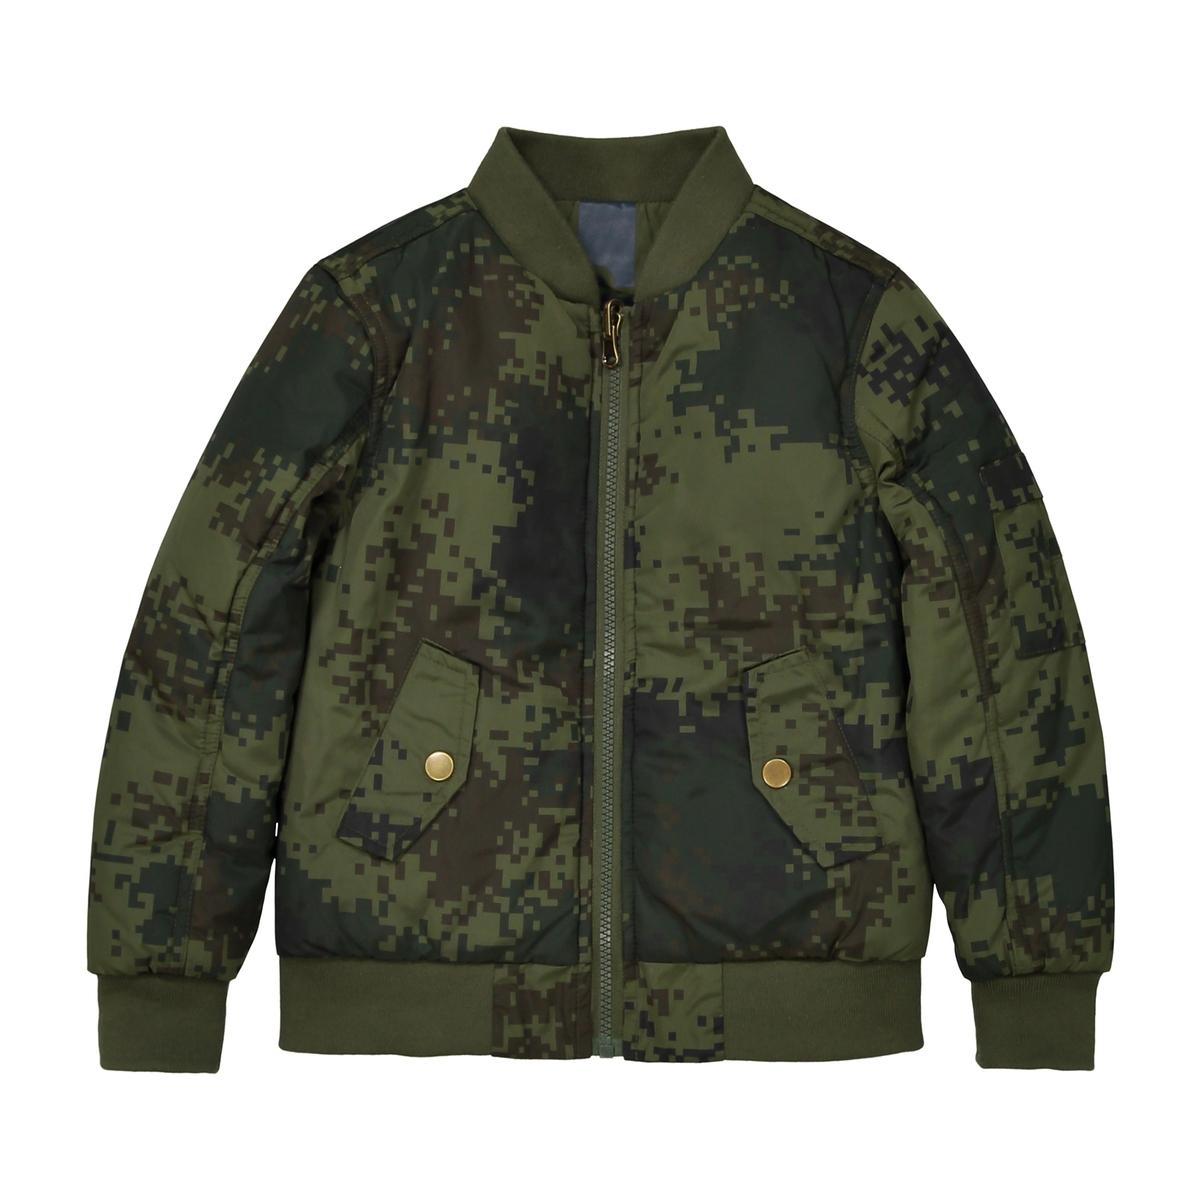 Куртка-бомбер двухсторонняя, 3-12 лет